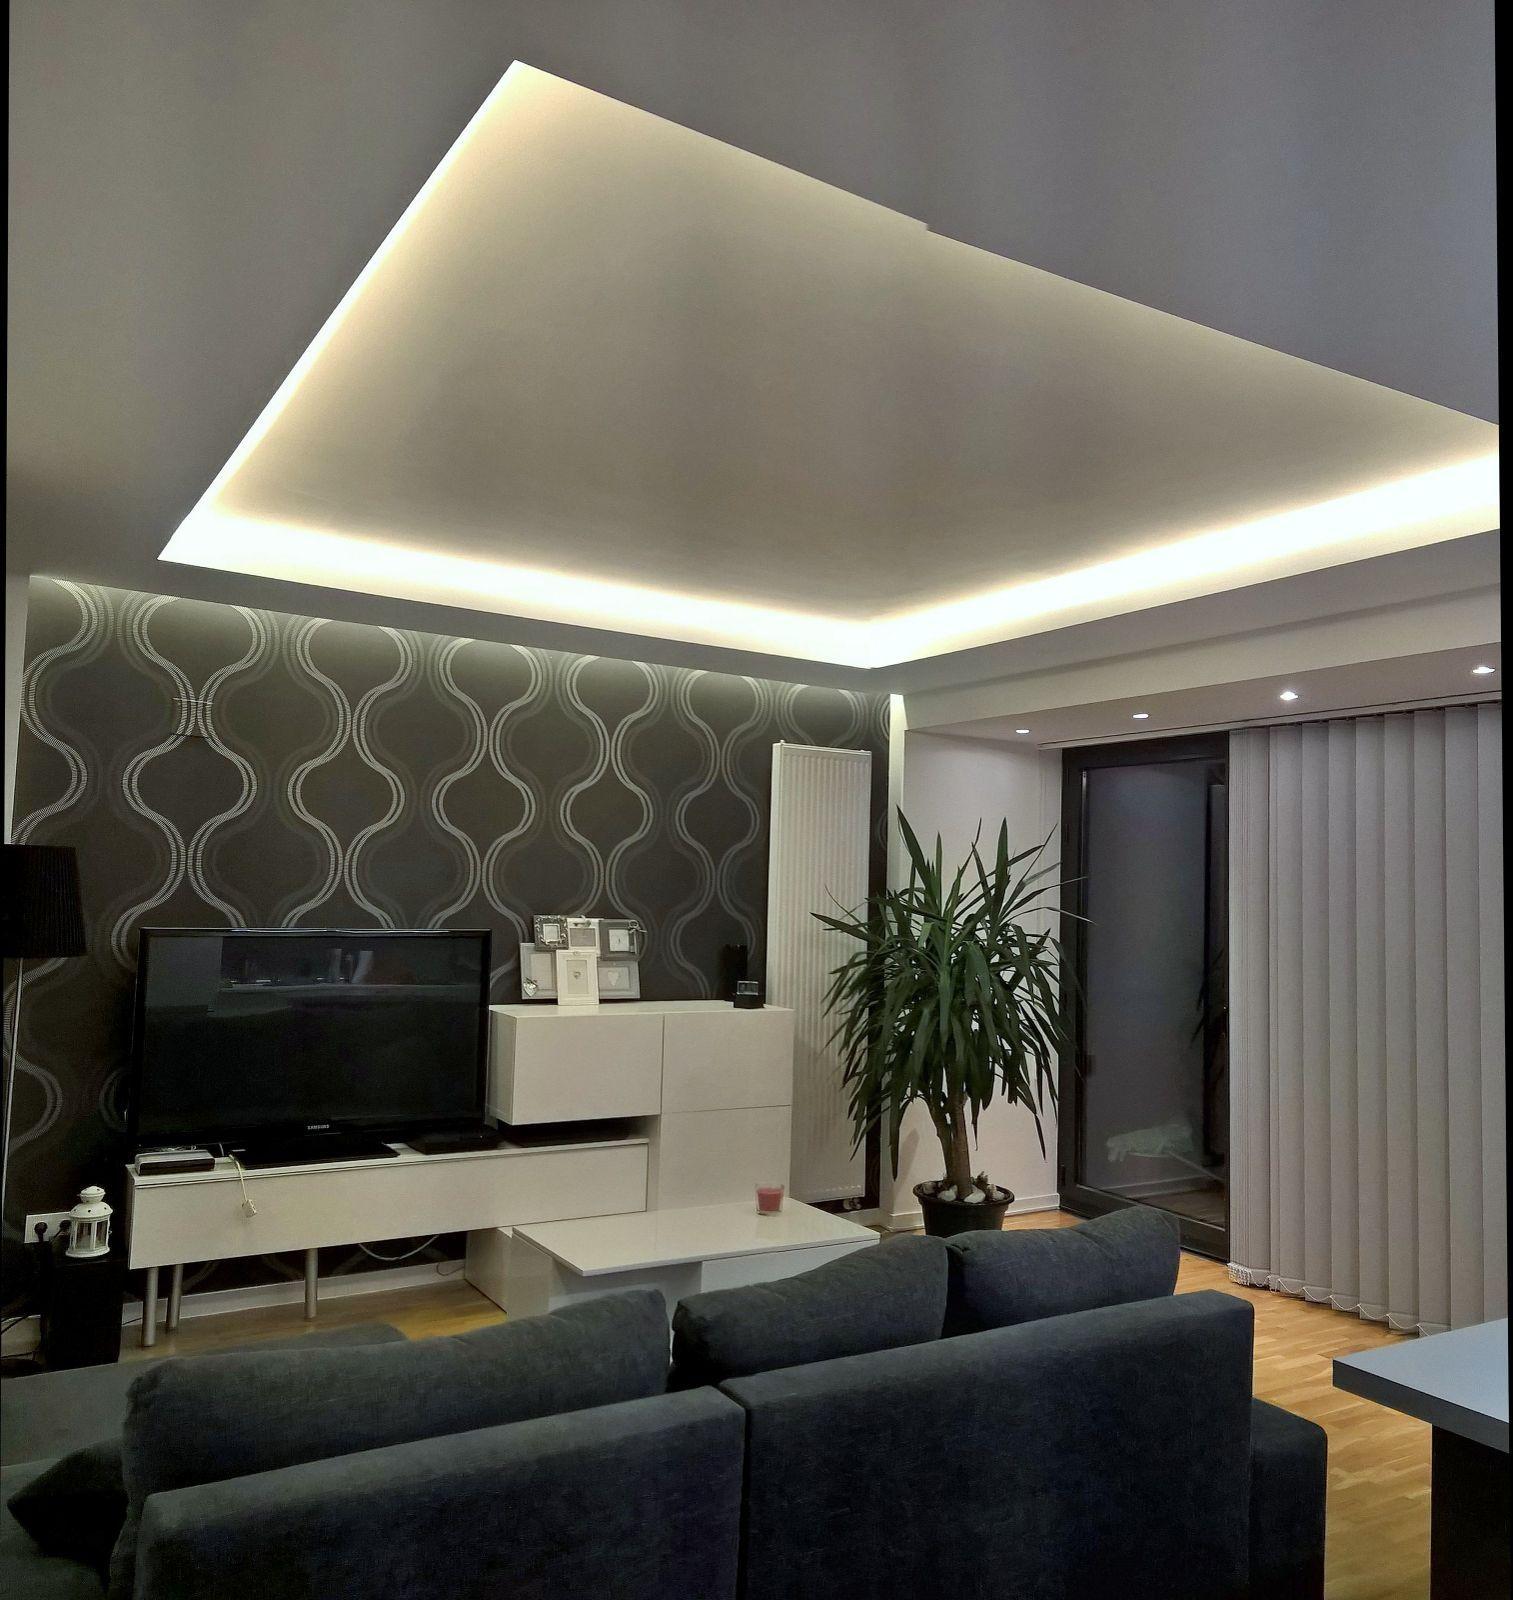 Sal n iluminado con foseados de pladur con tiras de leds y dicroicas led empotradas techo - Iluminacion led escaleras ...